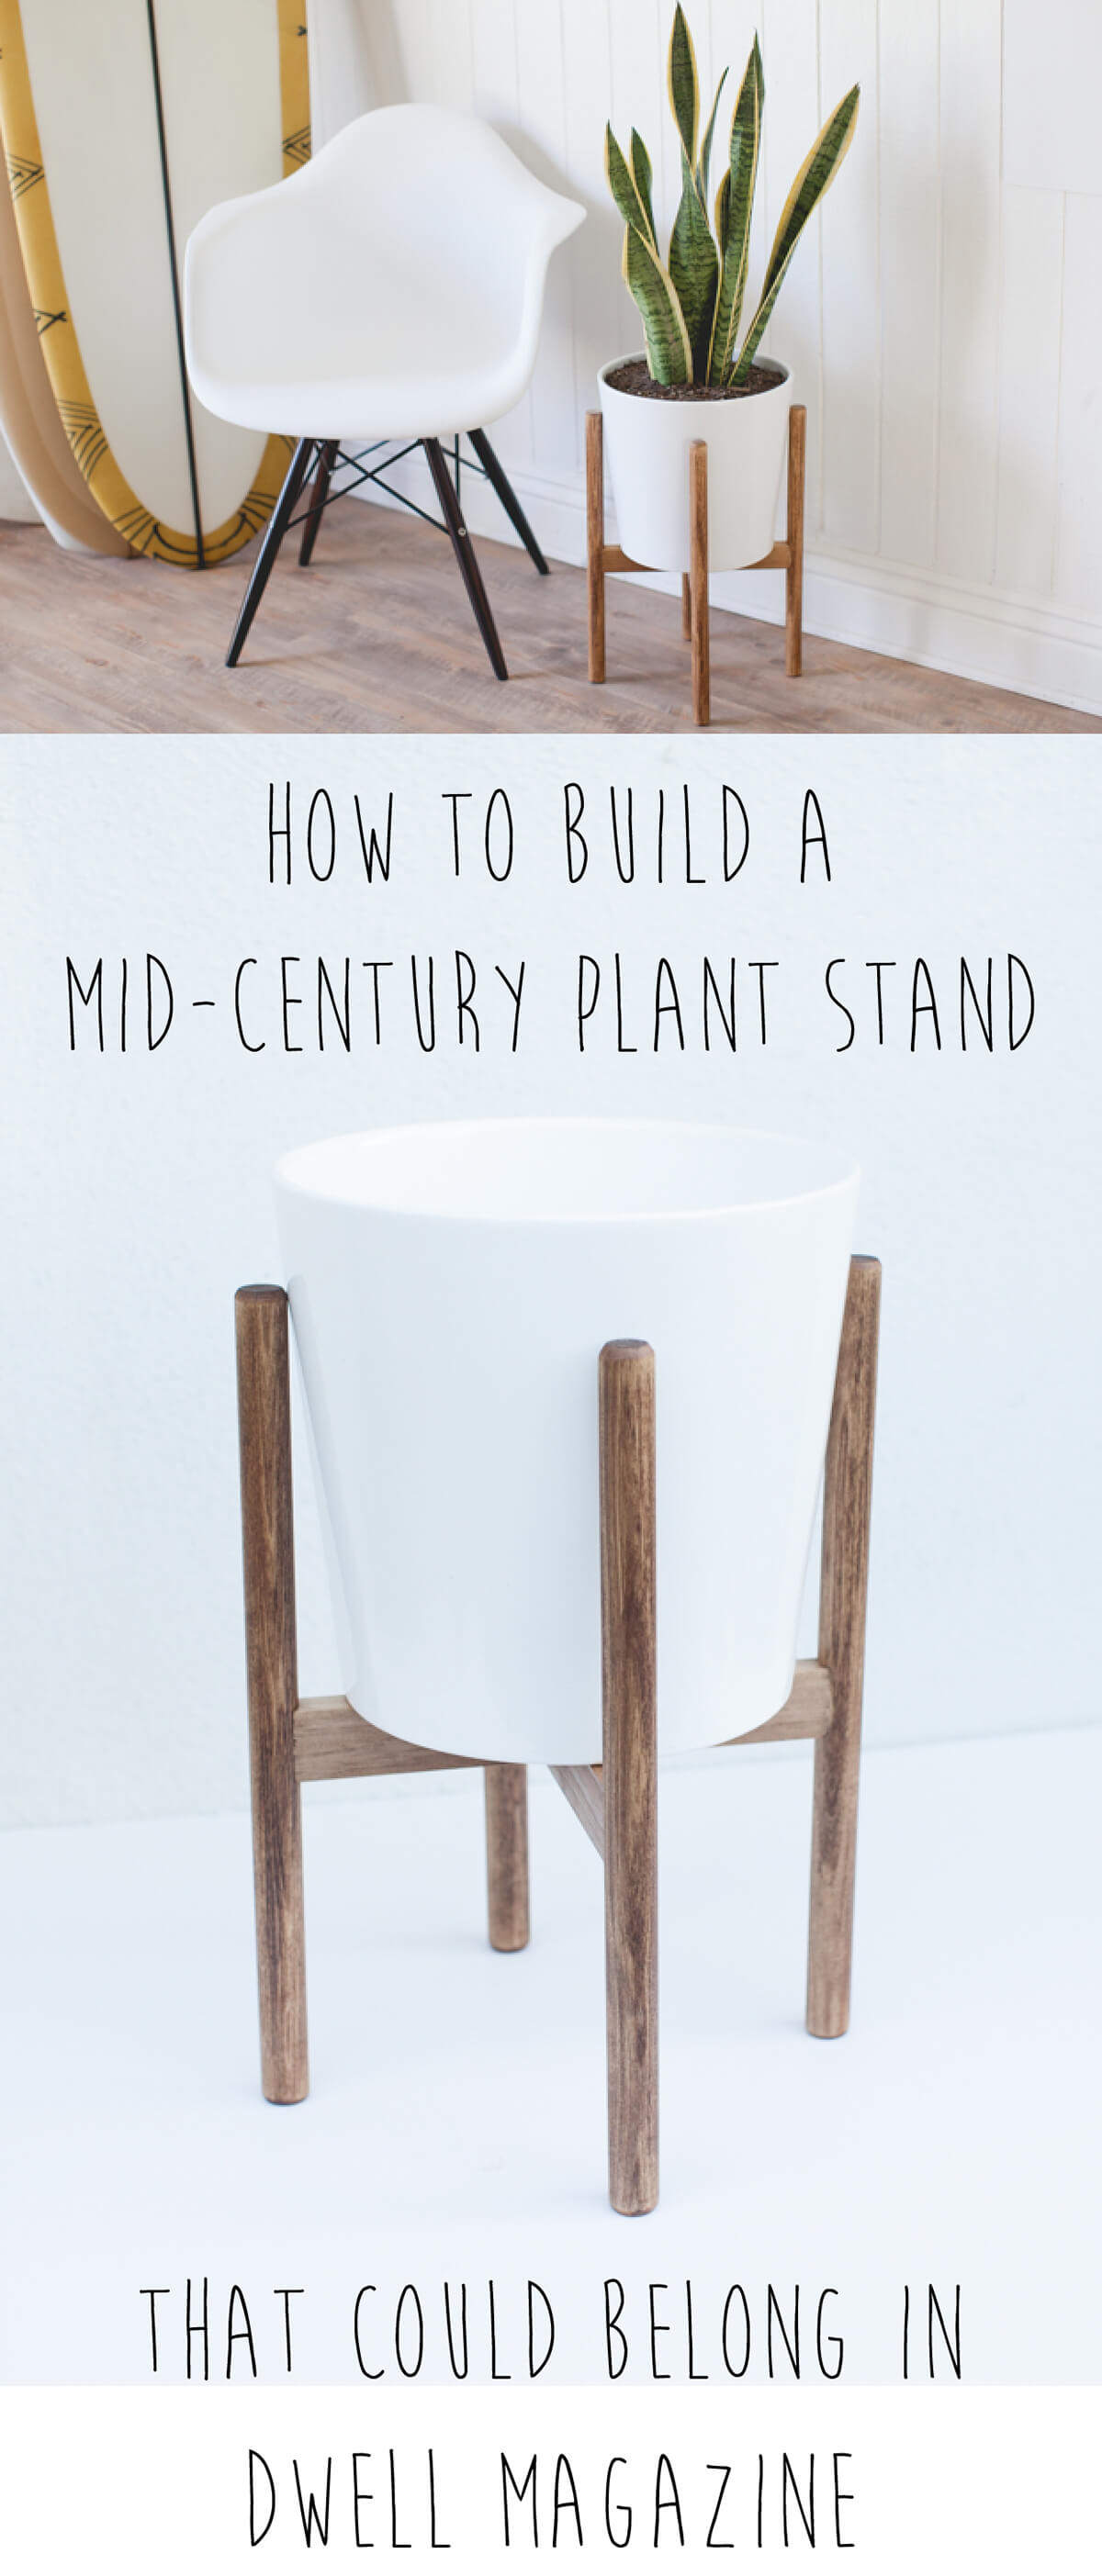 Handmade Mid-Century Plant Stand